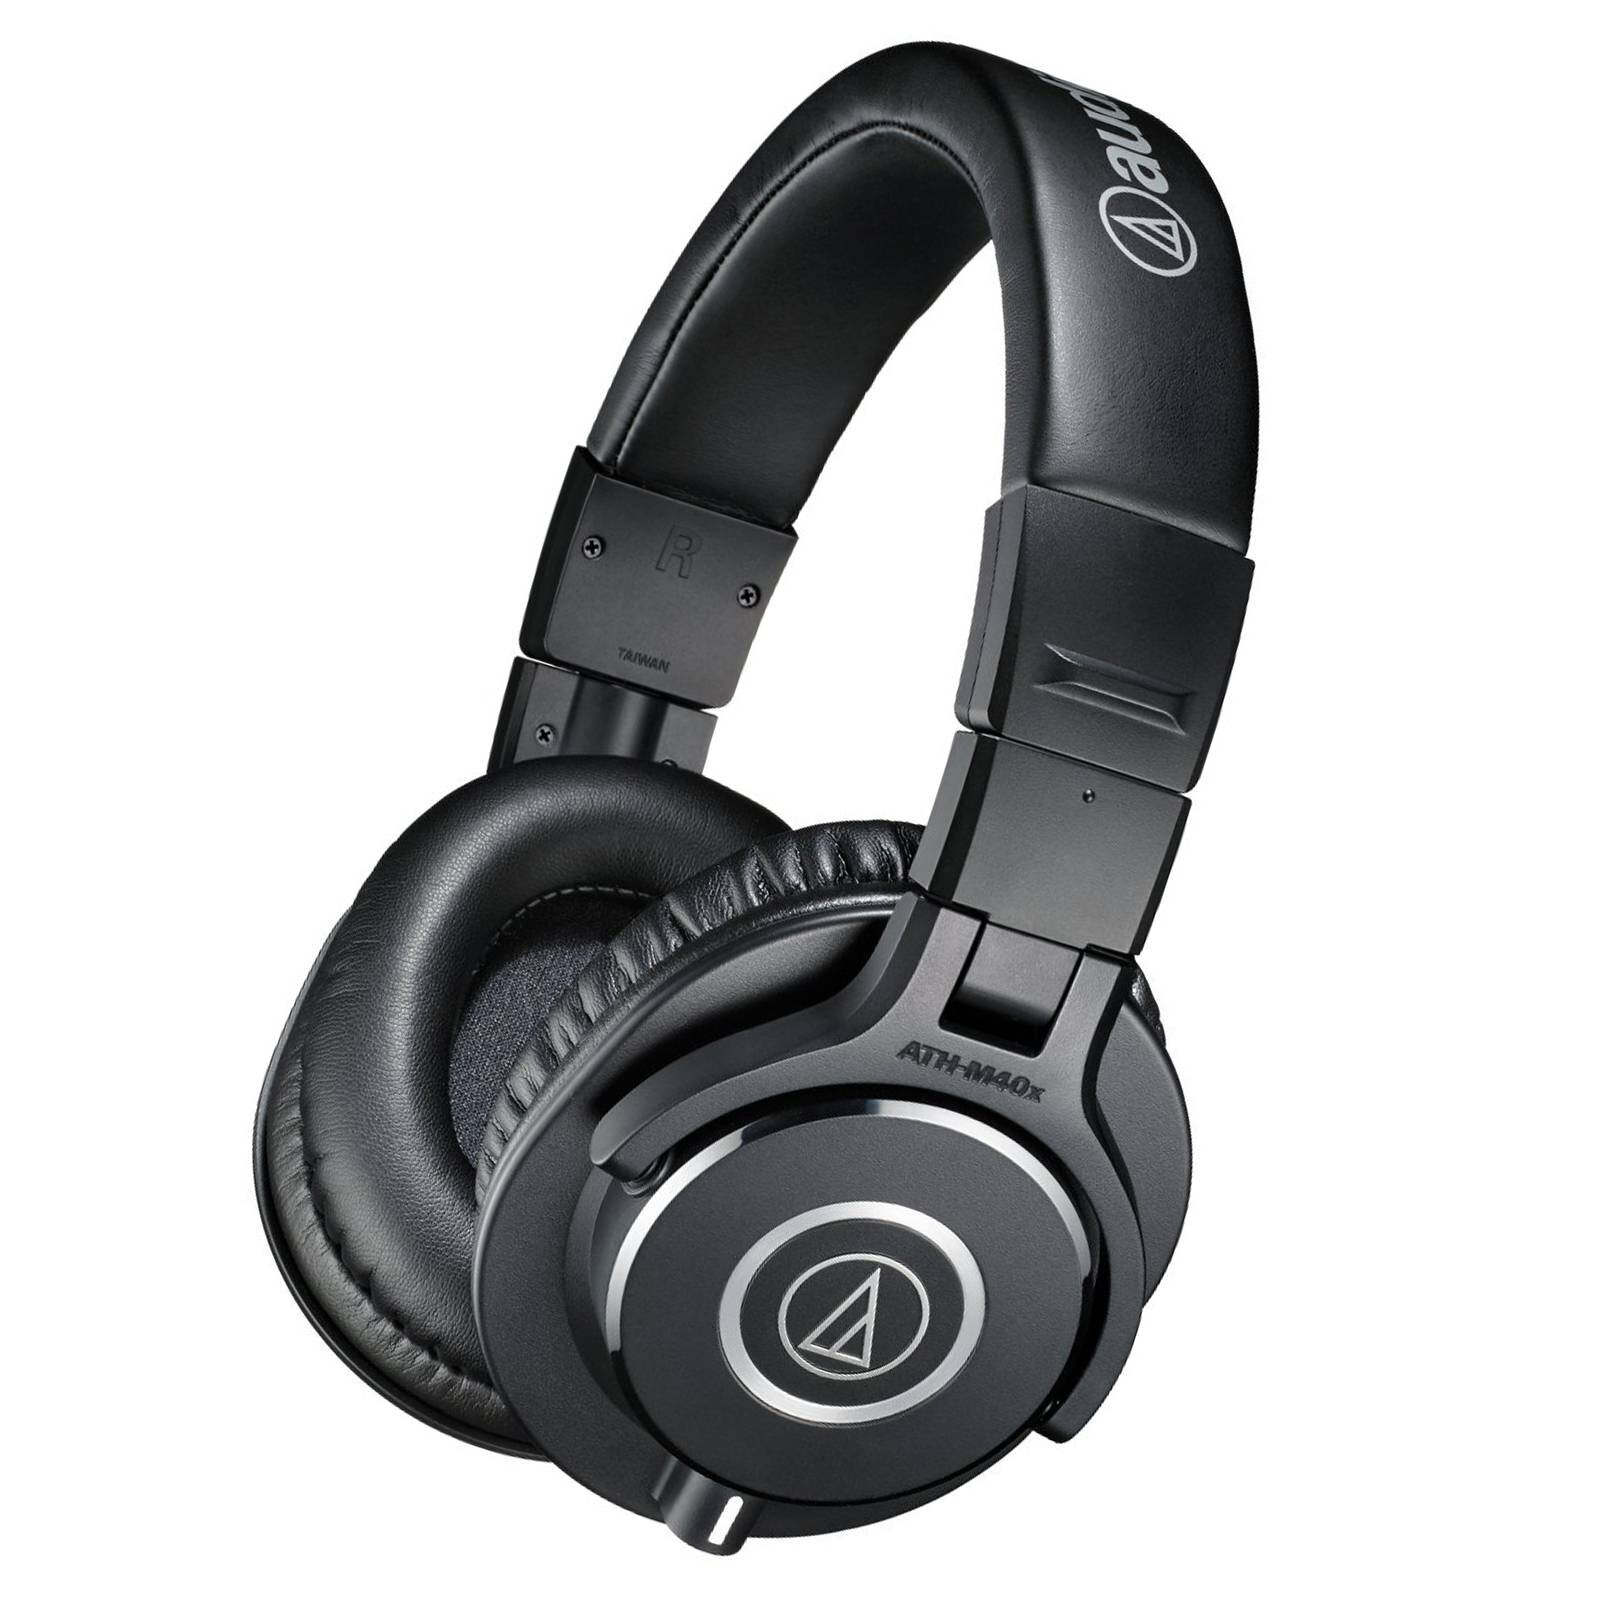 Tai nghe Audio Technica ATH-M40x